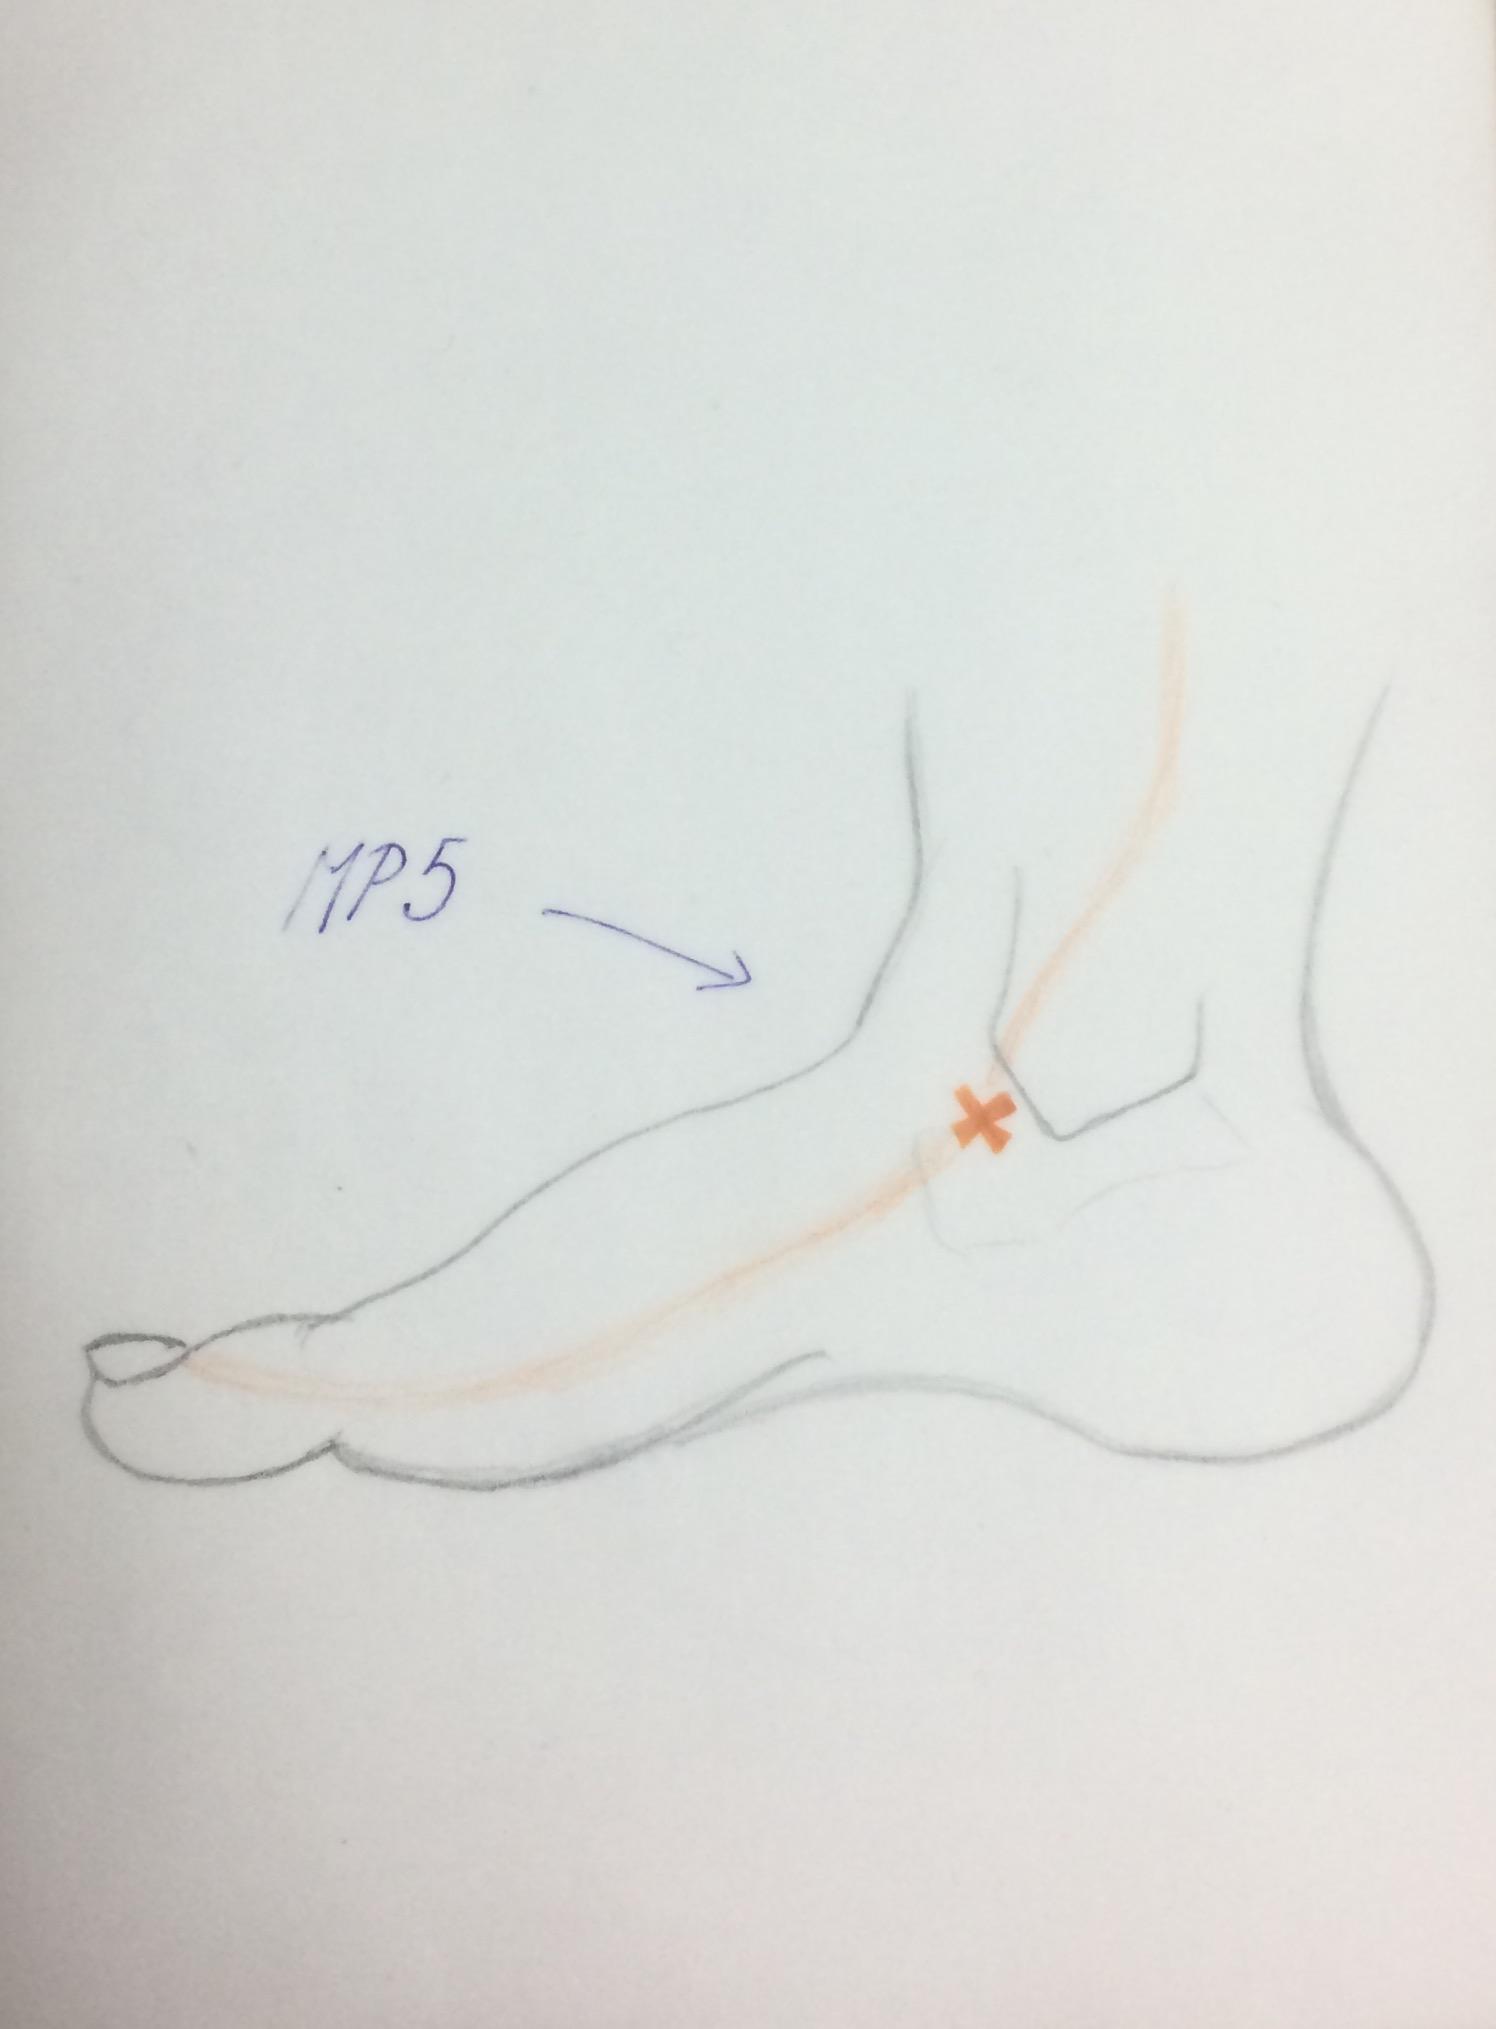 akupunkturpunkte zum abnehmen